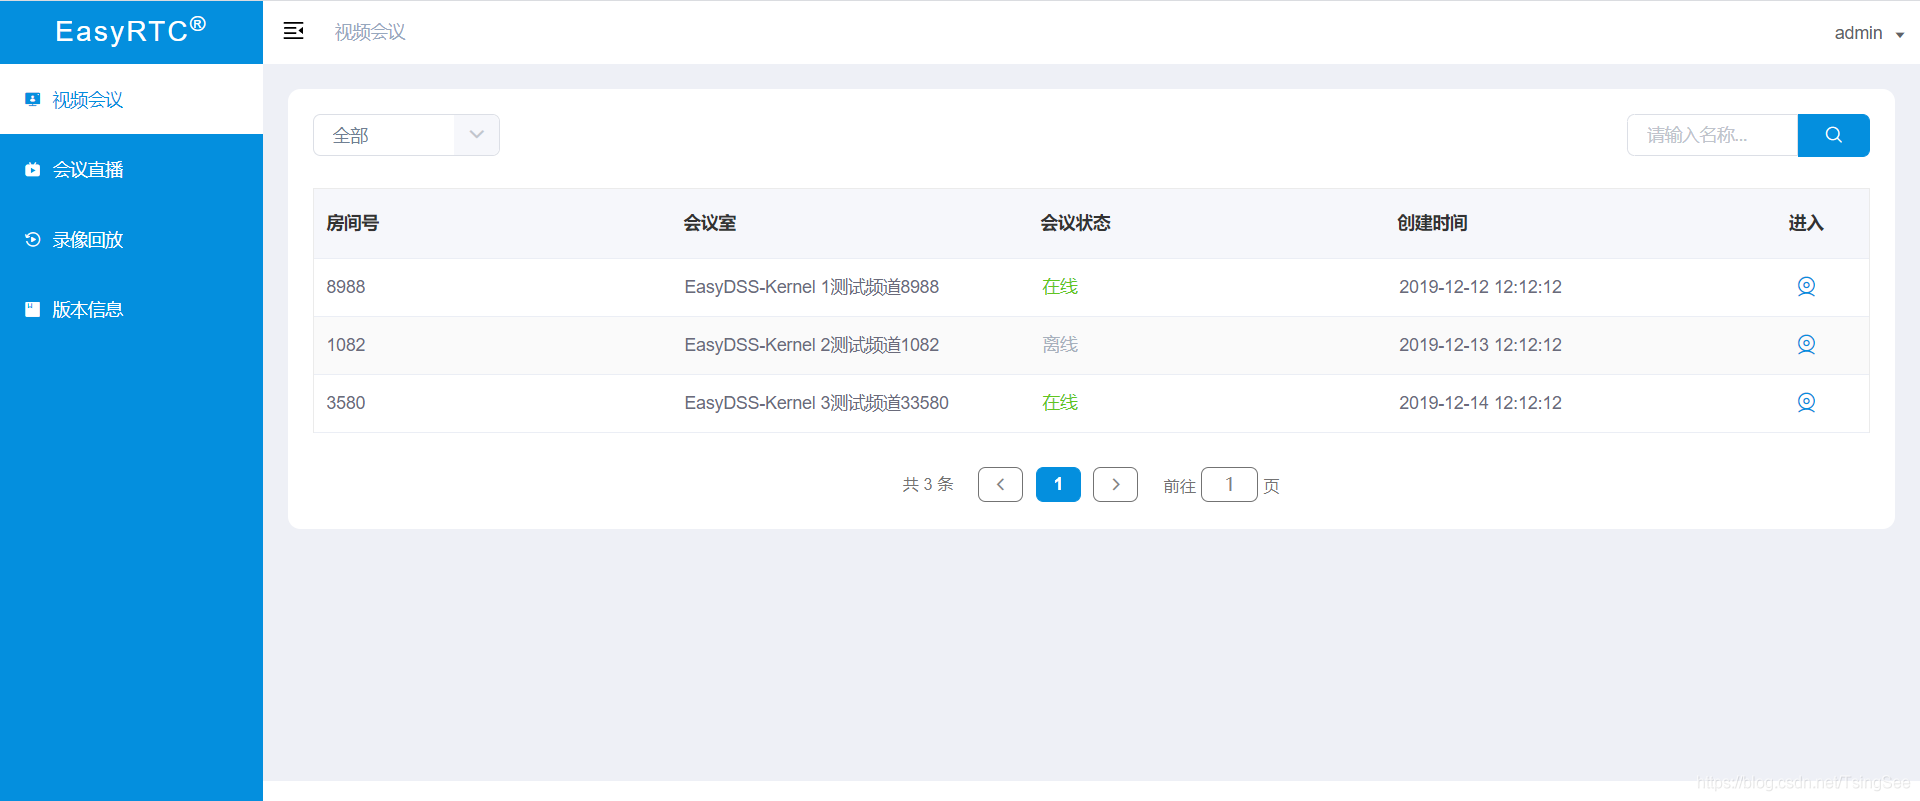 EasyRTC.cn